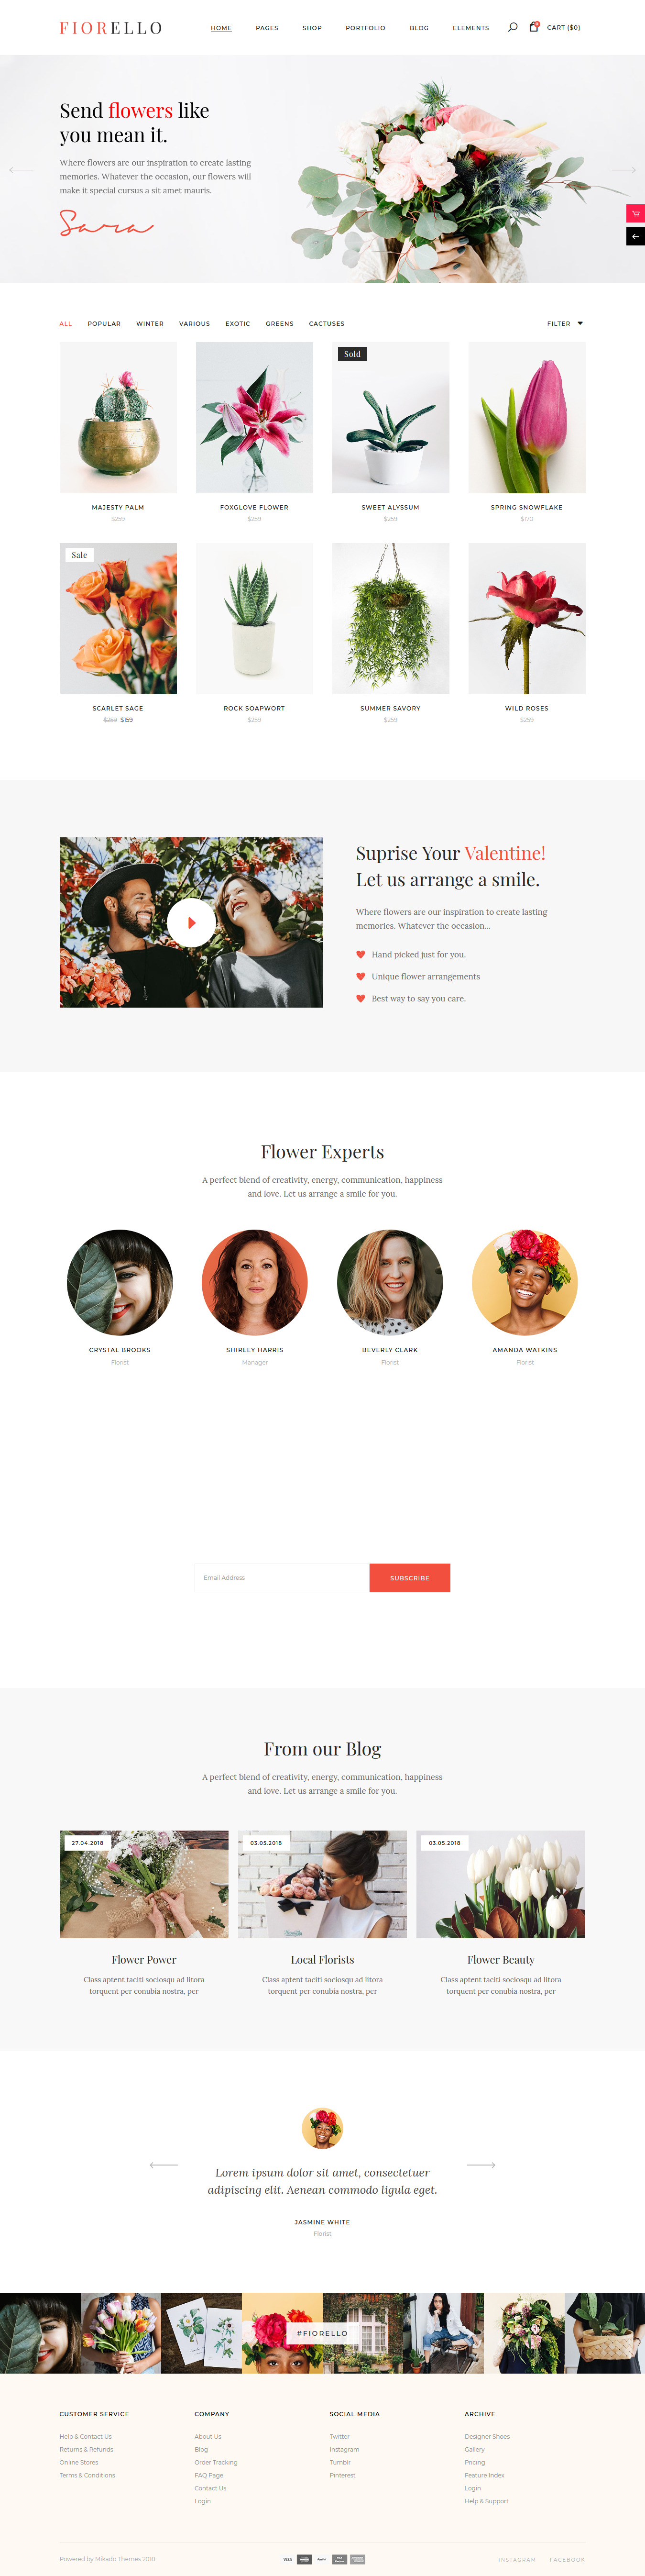 fiorello best premium florist floriculture wordpress theme - 10+ Best Premium Florist and Floriculture WordPress Themes